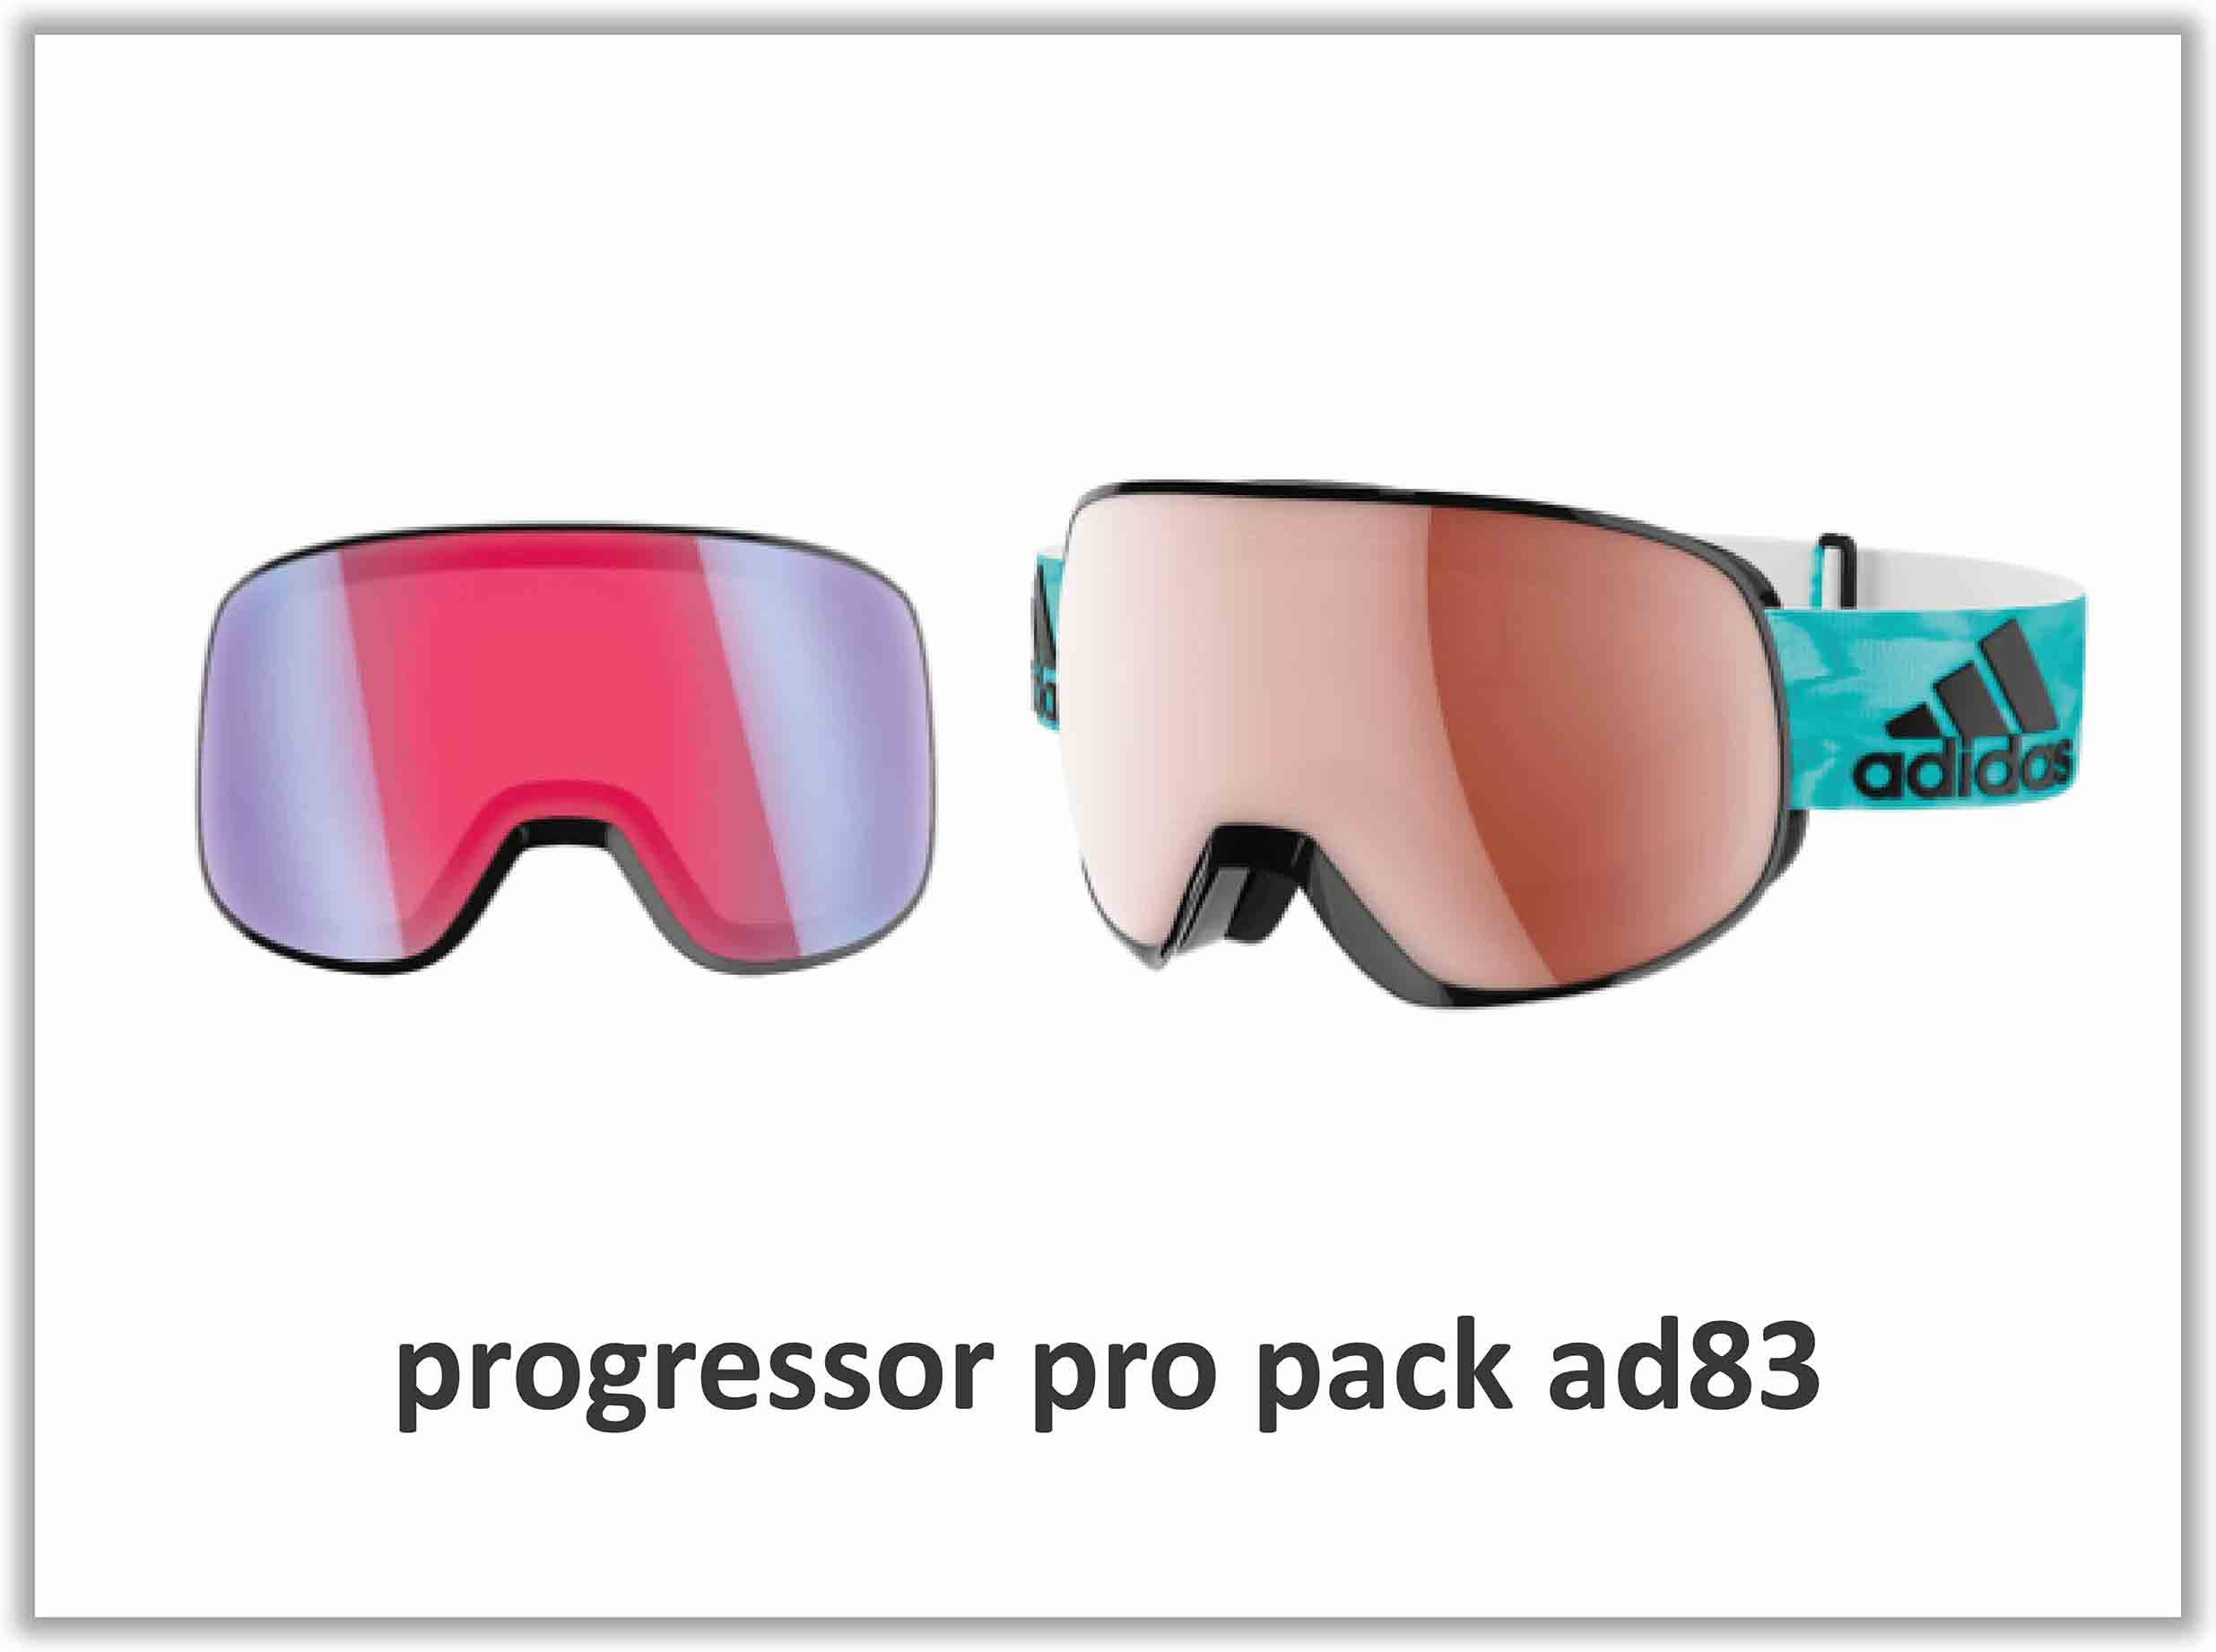 progressor pro pack